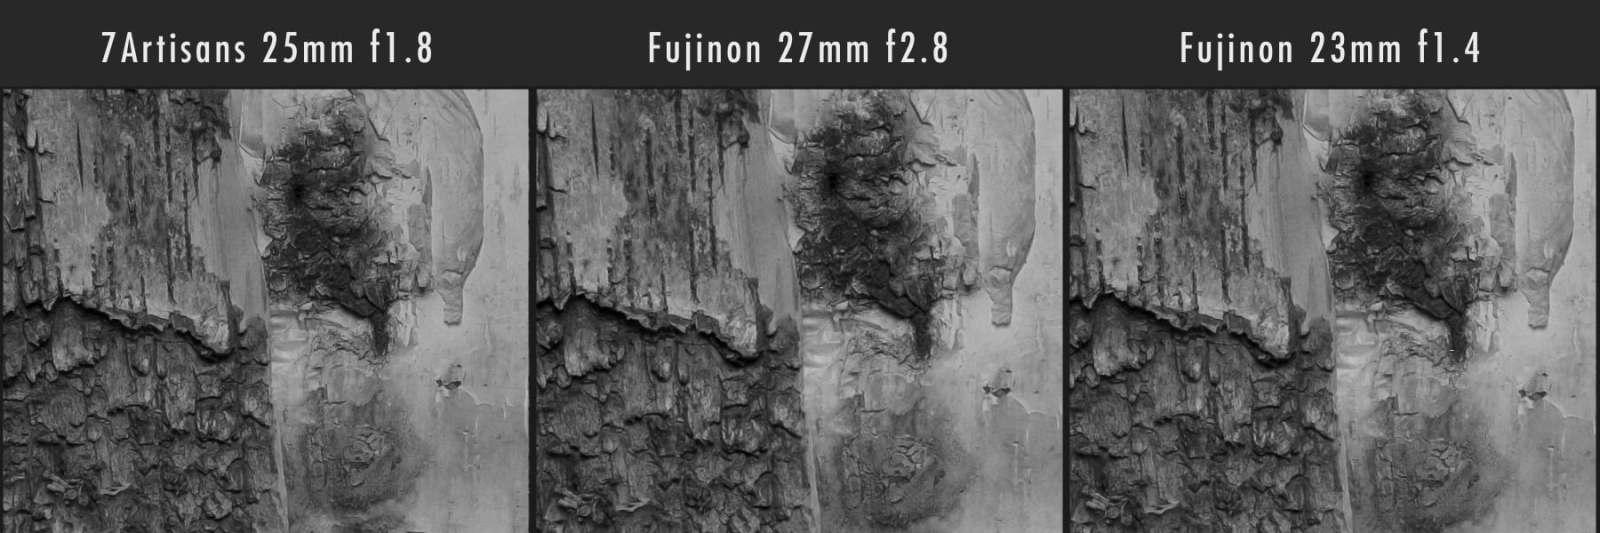 7Artisans 25mm f1.8 Microcontrast